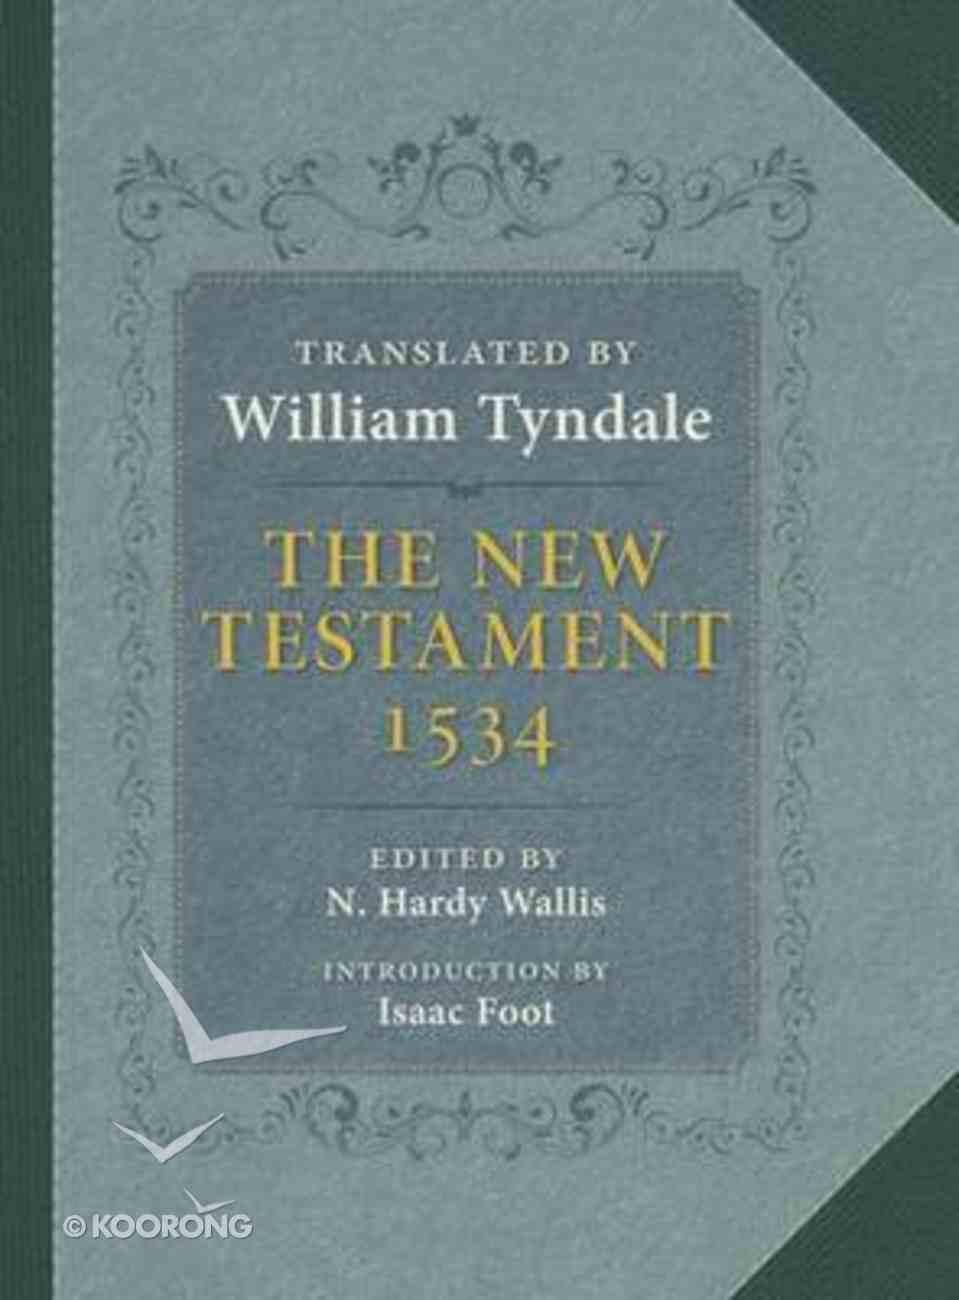 The New Testament 1534 Hardback